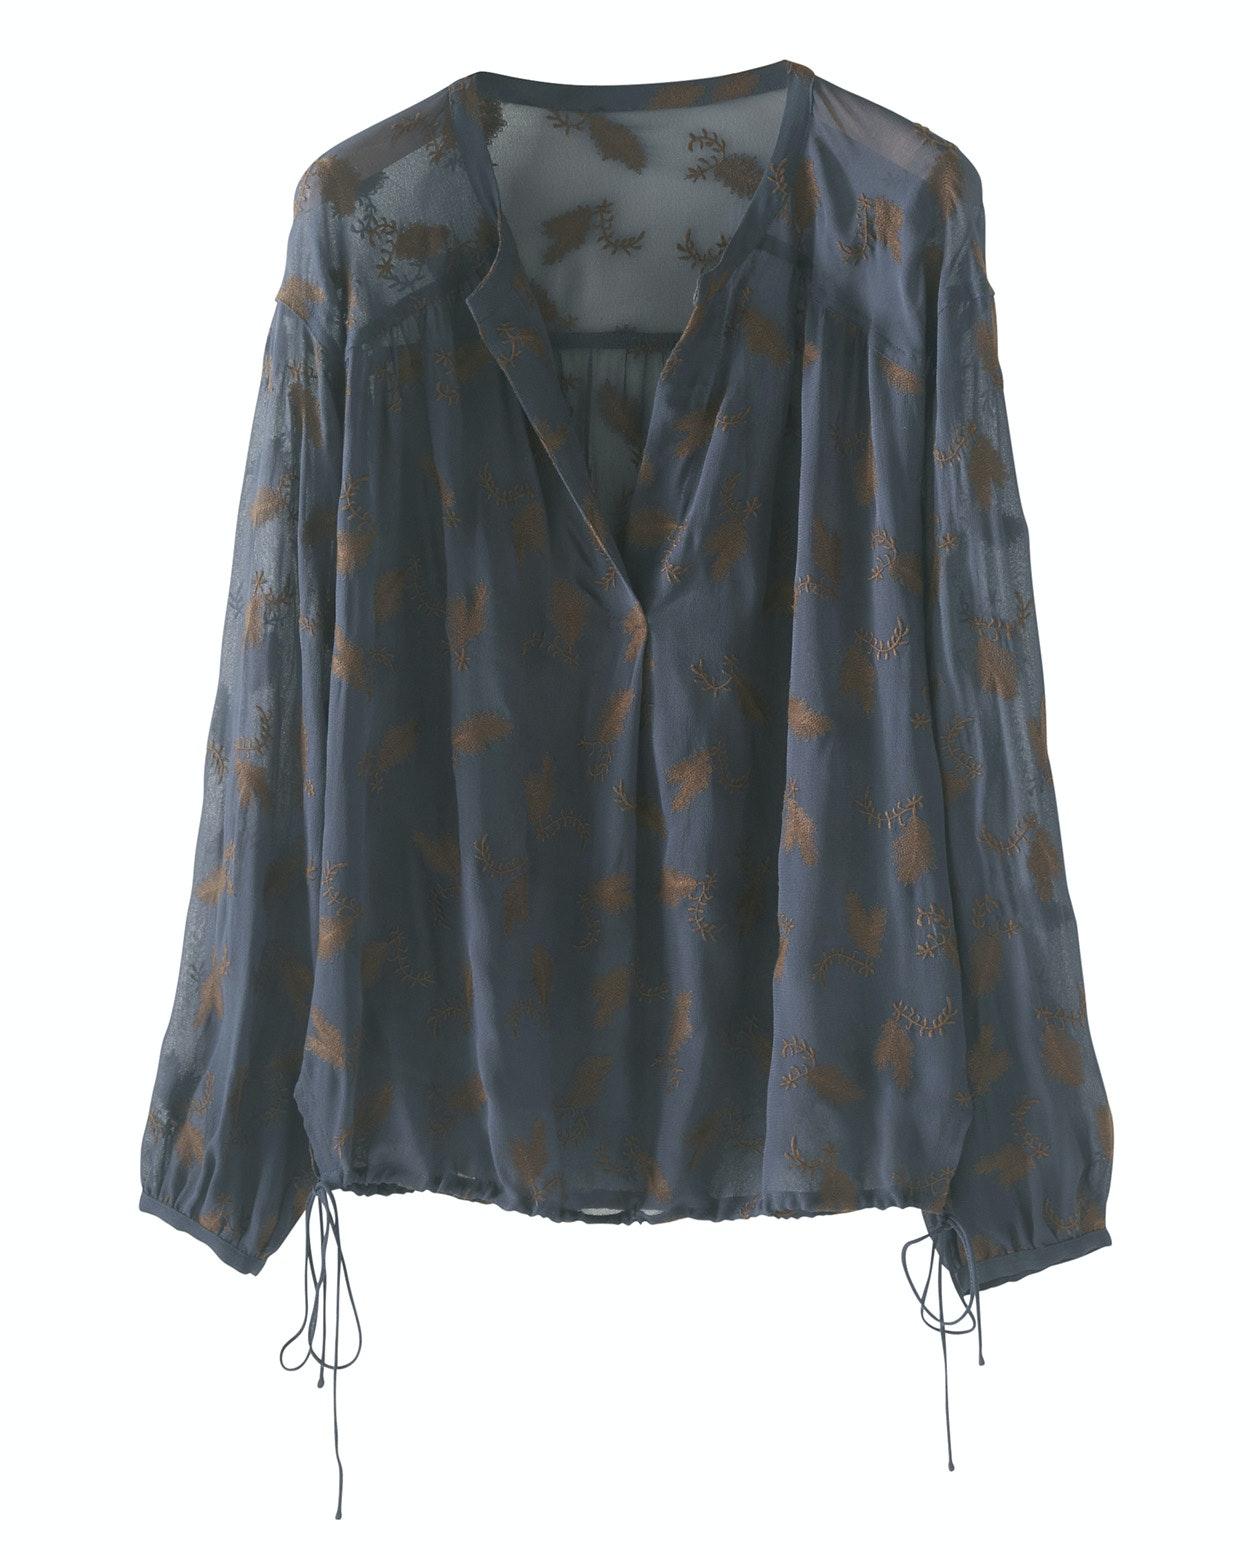 326d9daead845 Margot blouse - Wrap London